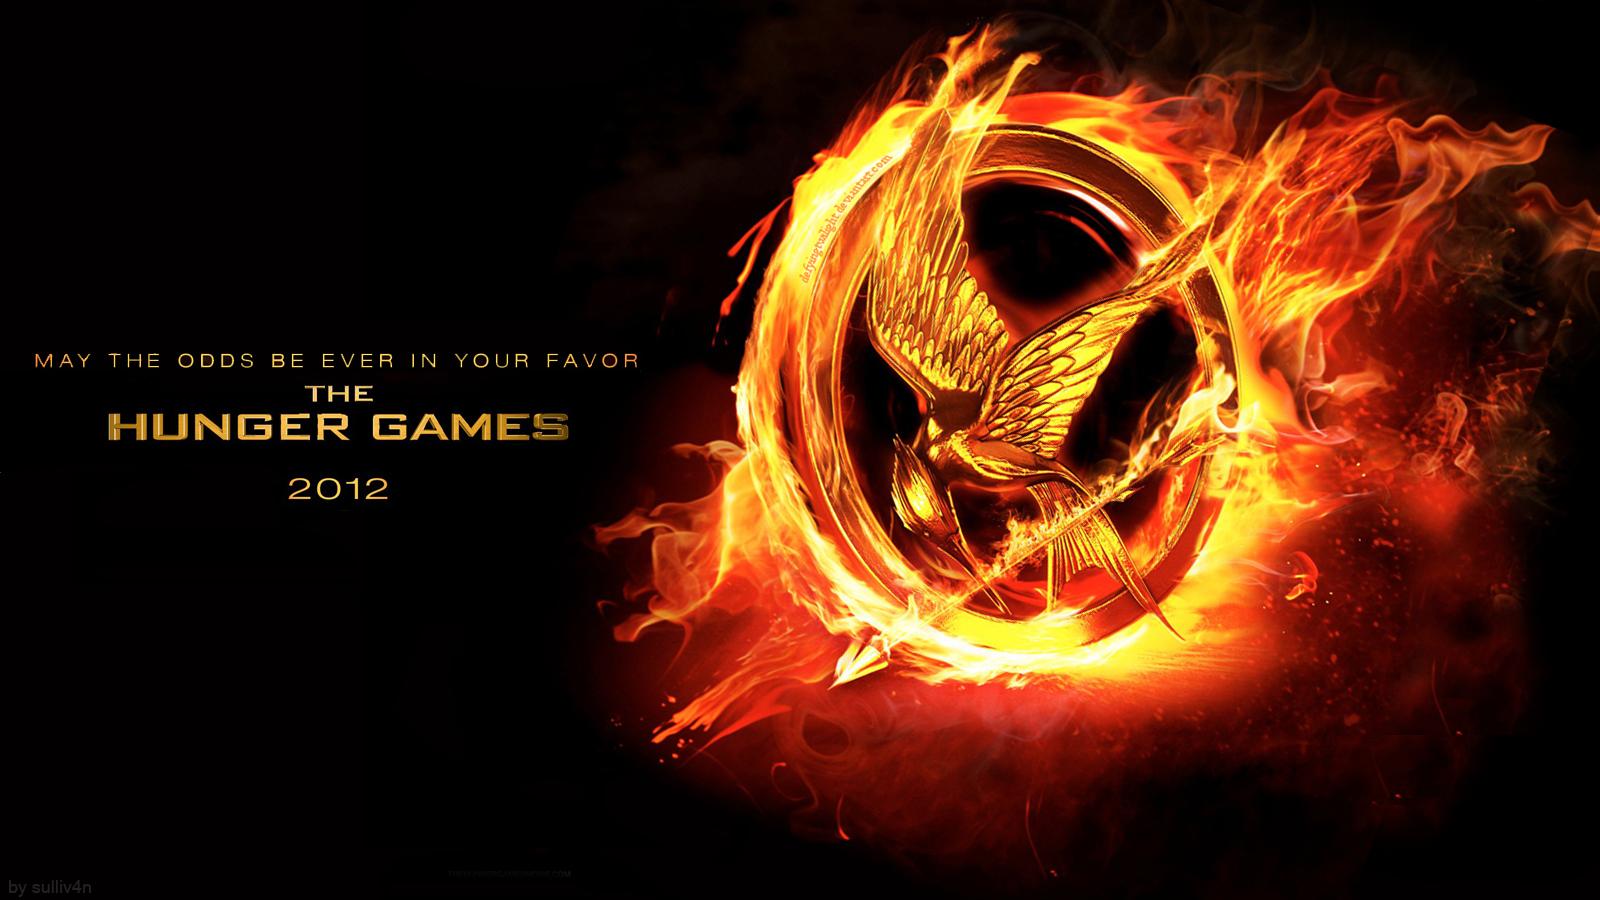 The Hunger Games Wallpaper   The Hunger Games Wallpaper 28393405 1600x900